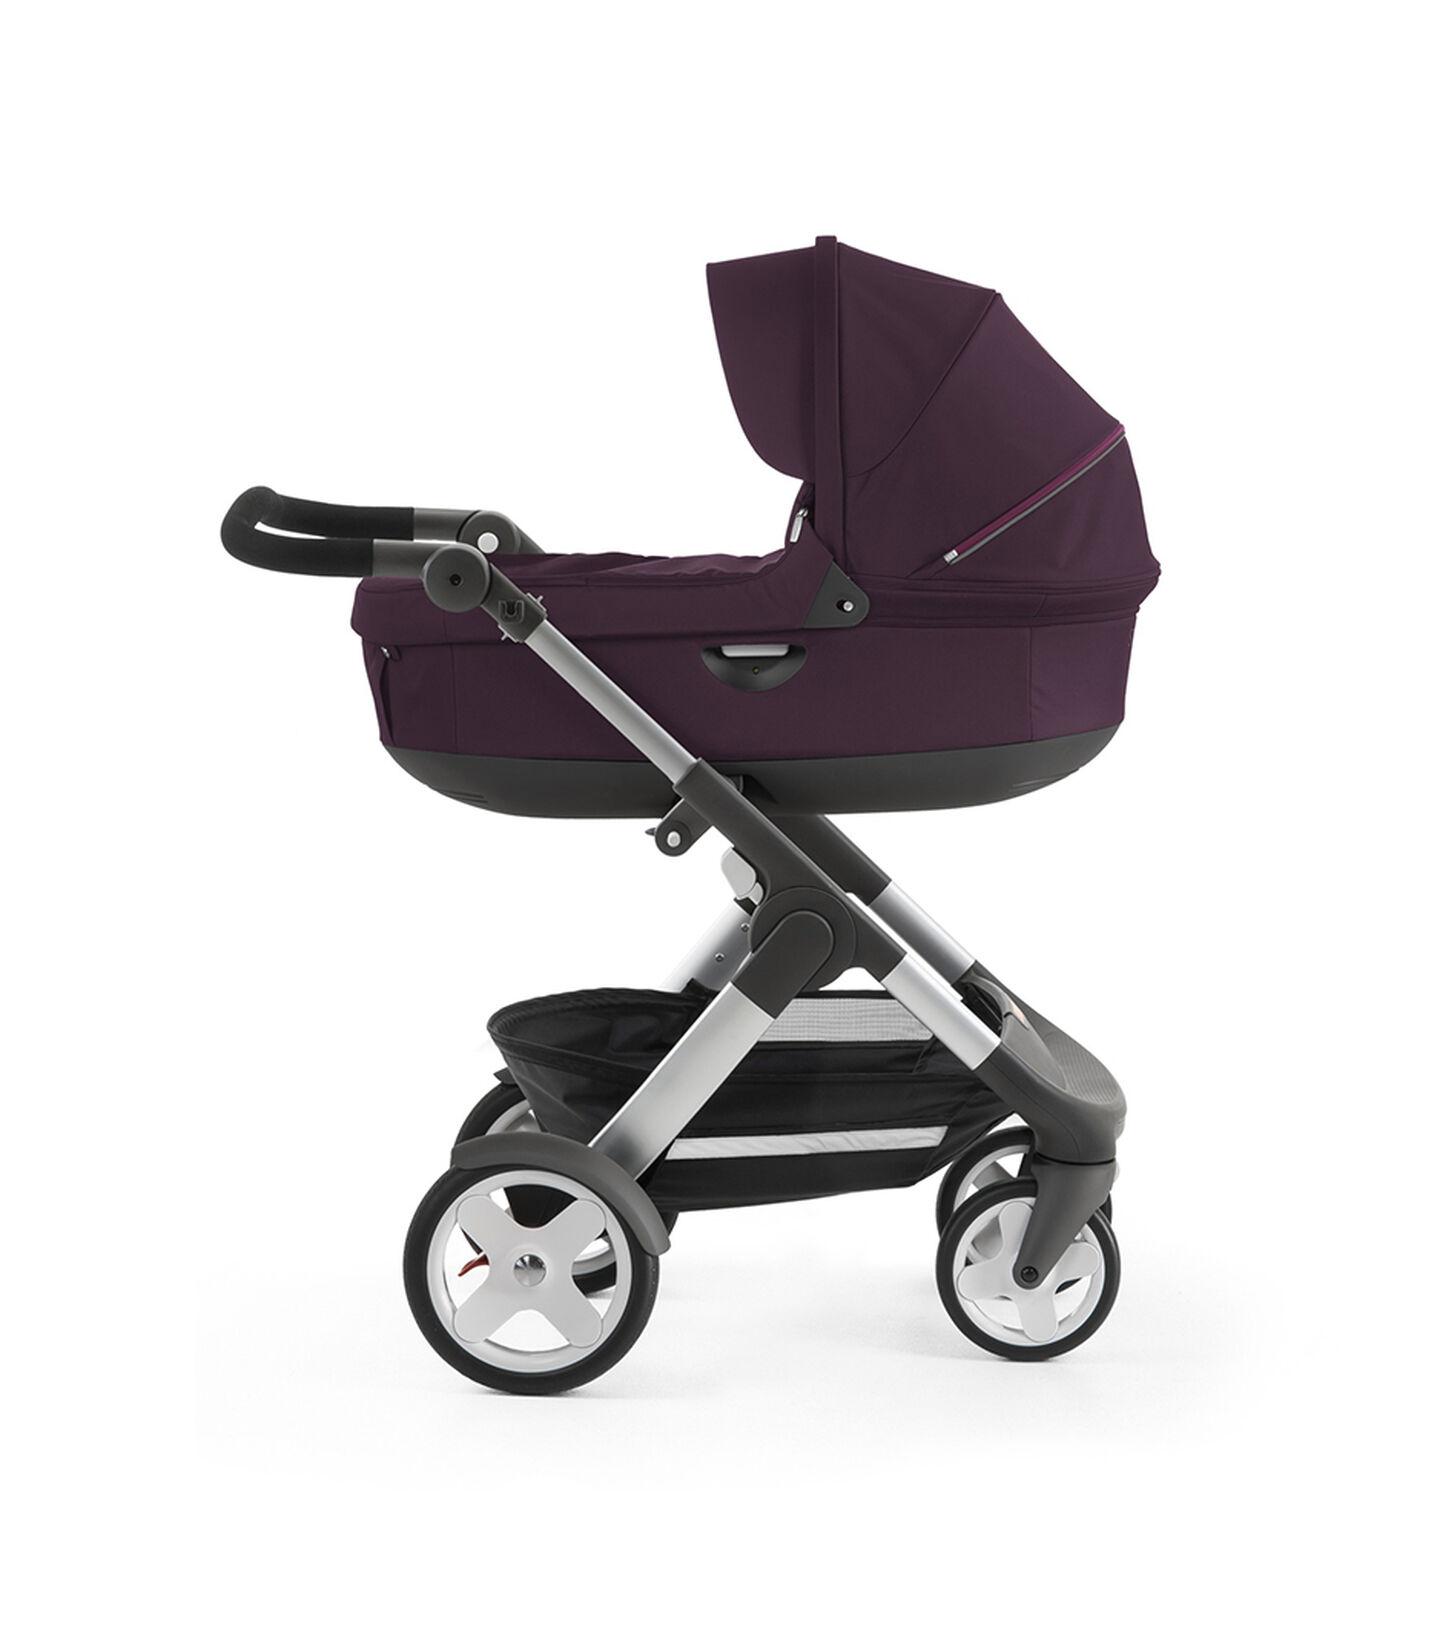 Stokke® Trailz™ Classic w Carry Cot Purple, Purple, mainview view 1